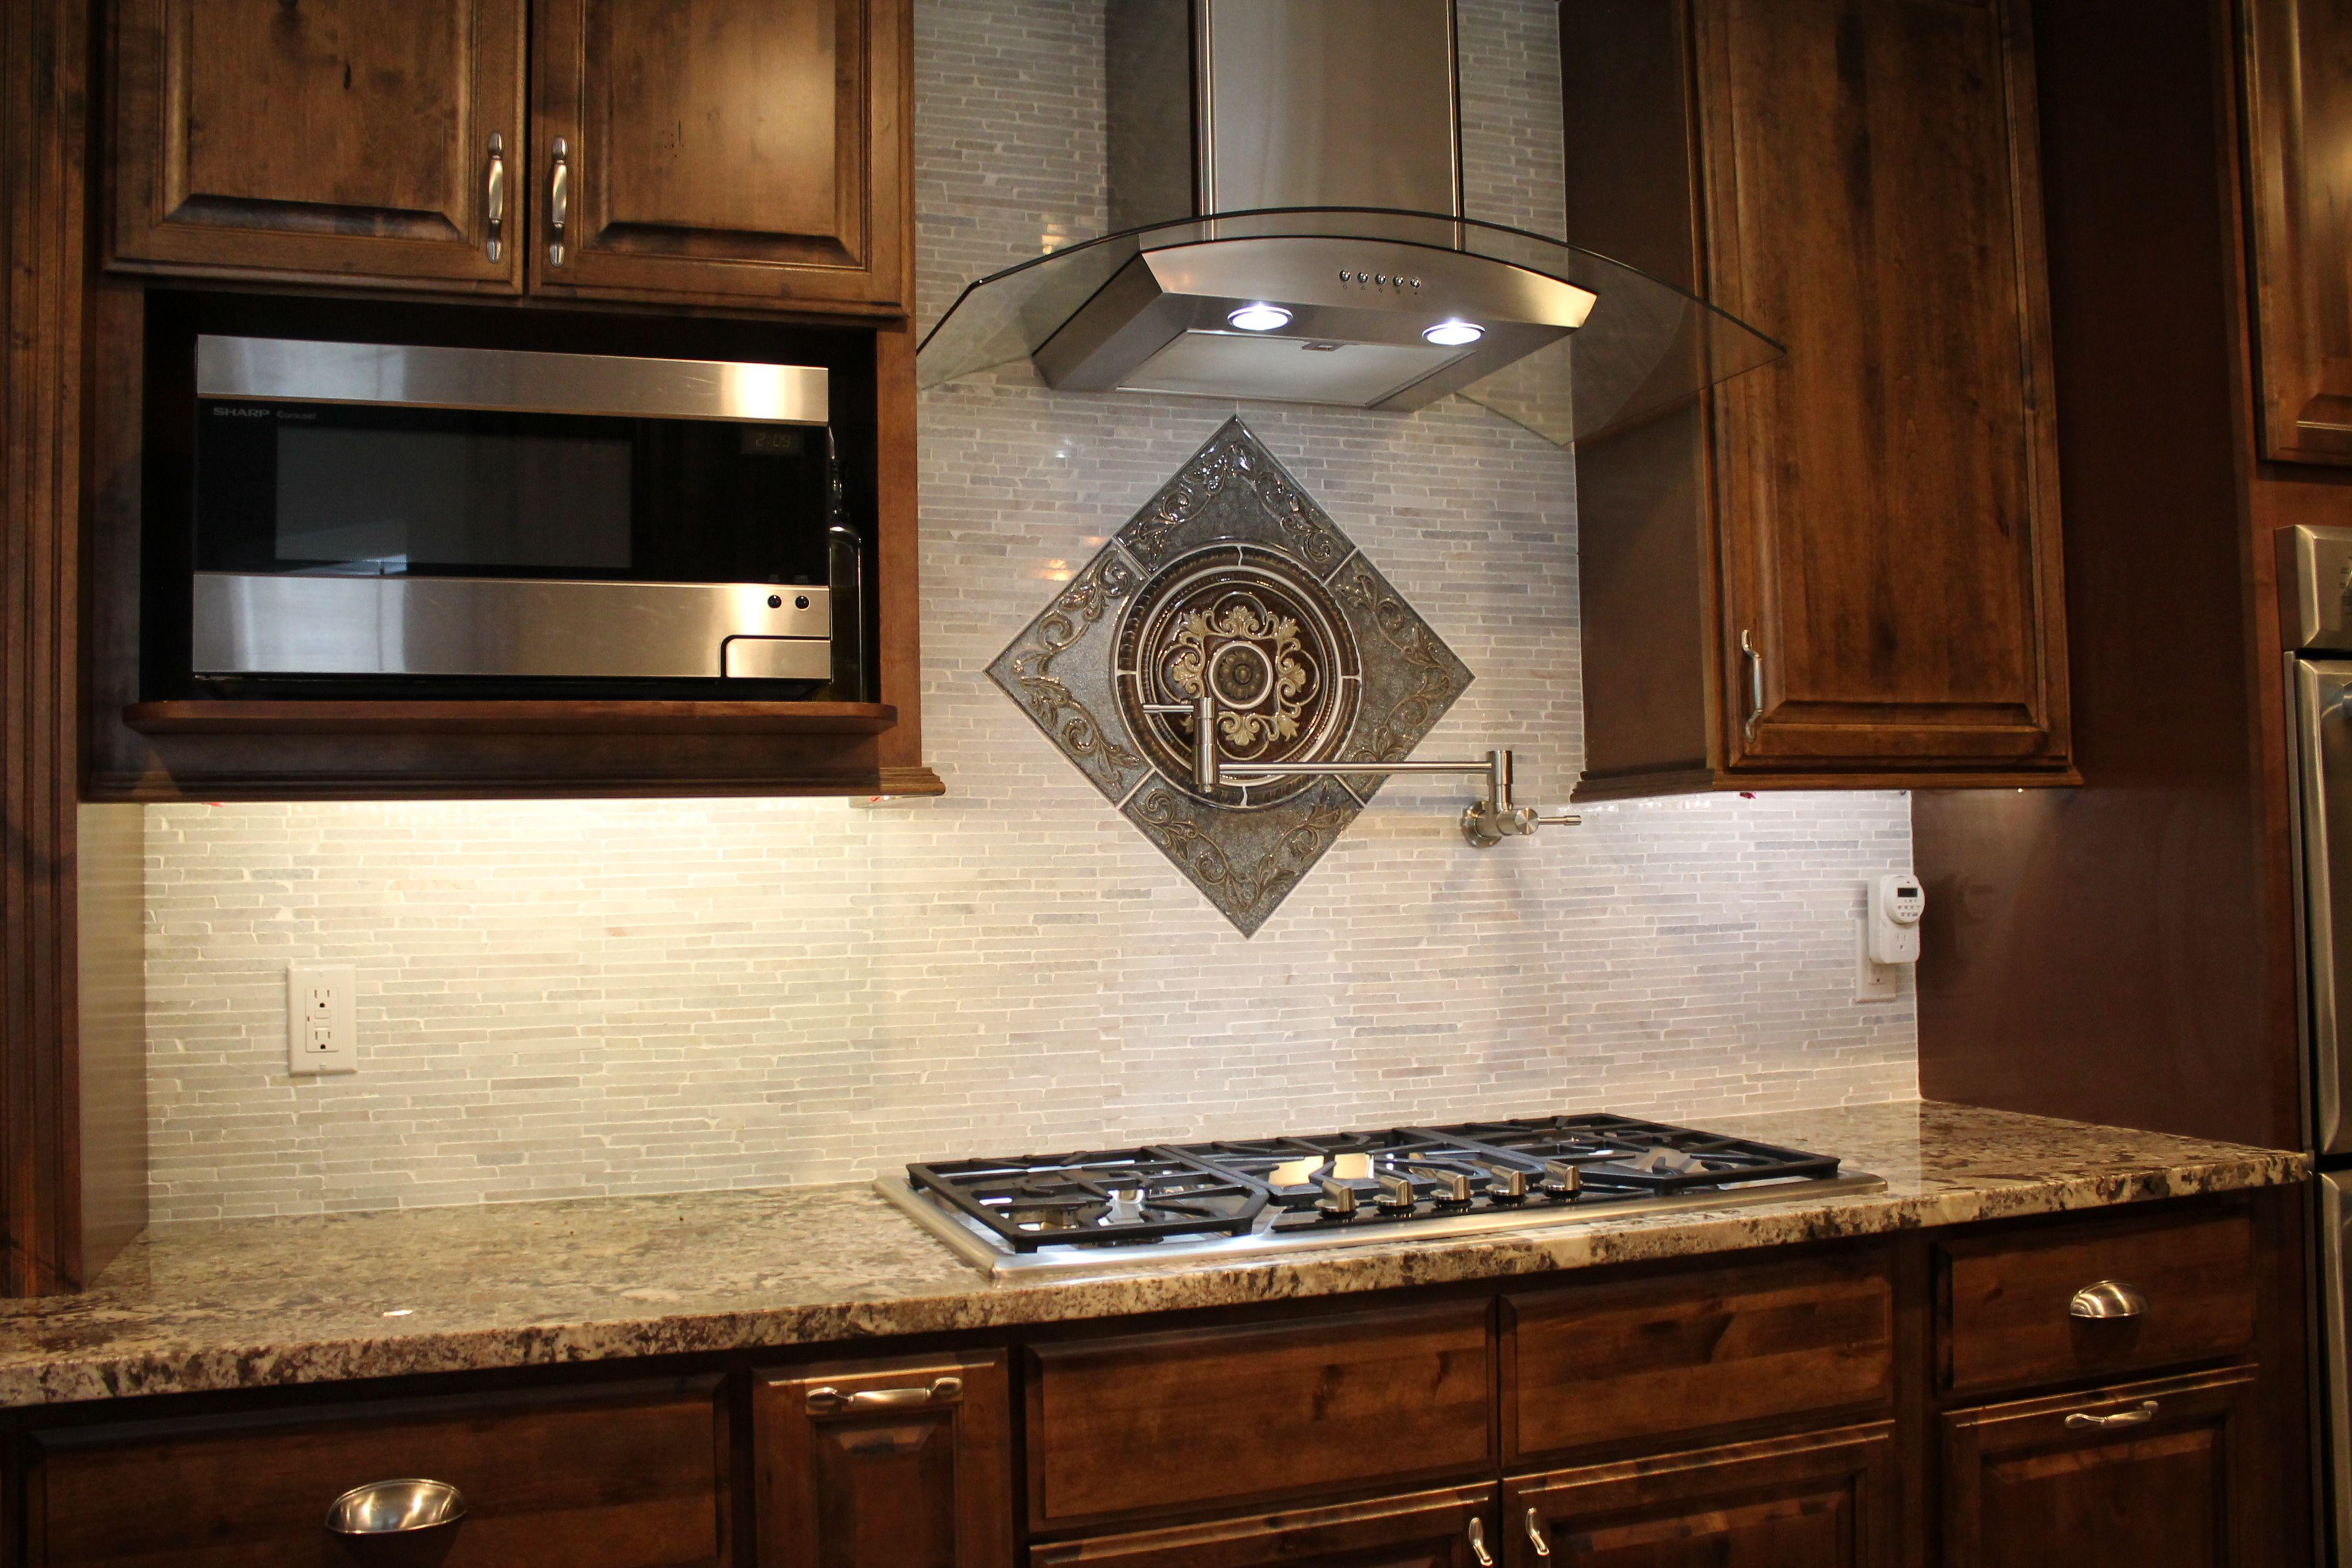 Kitchen design with dark wood cabinets granite countertops and gray kitchen design with dark wood cabinets granite countertops and gray brick tile backsplash dailygadgetfo Image collections